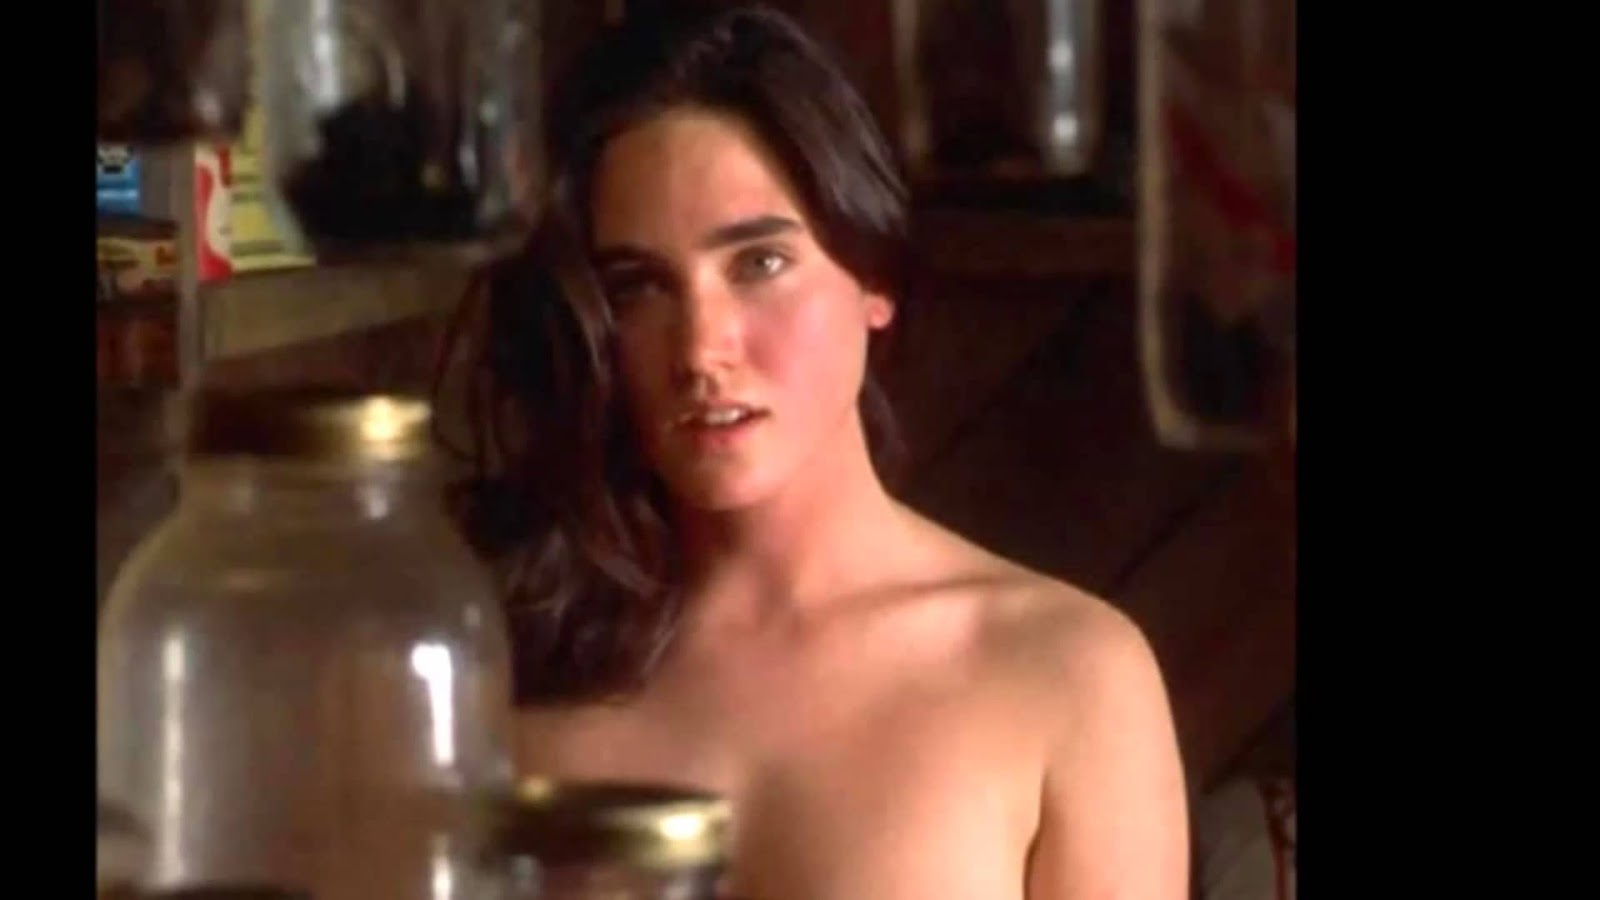 Jennifer connelly sexy naked picture timekiller